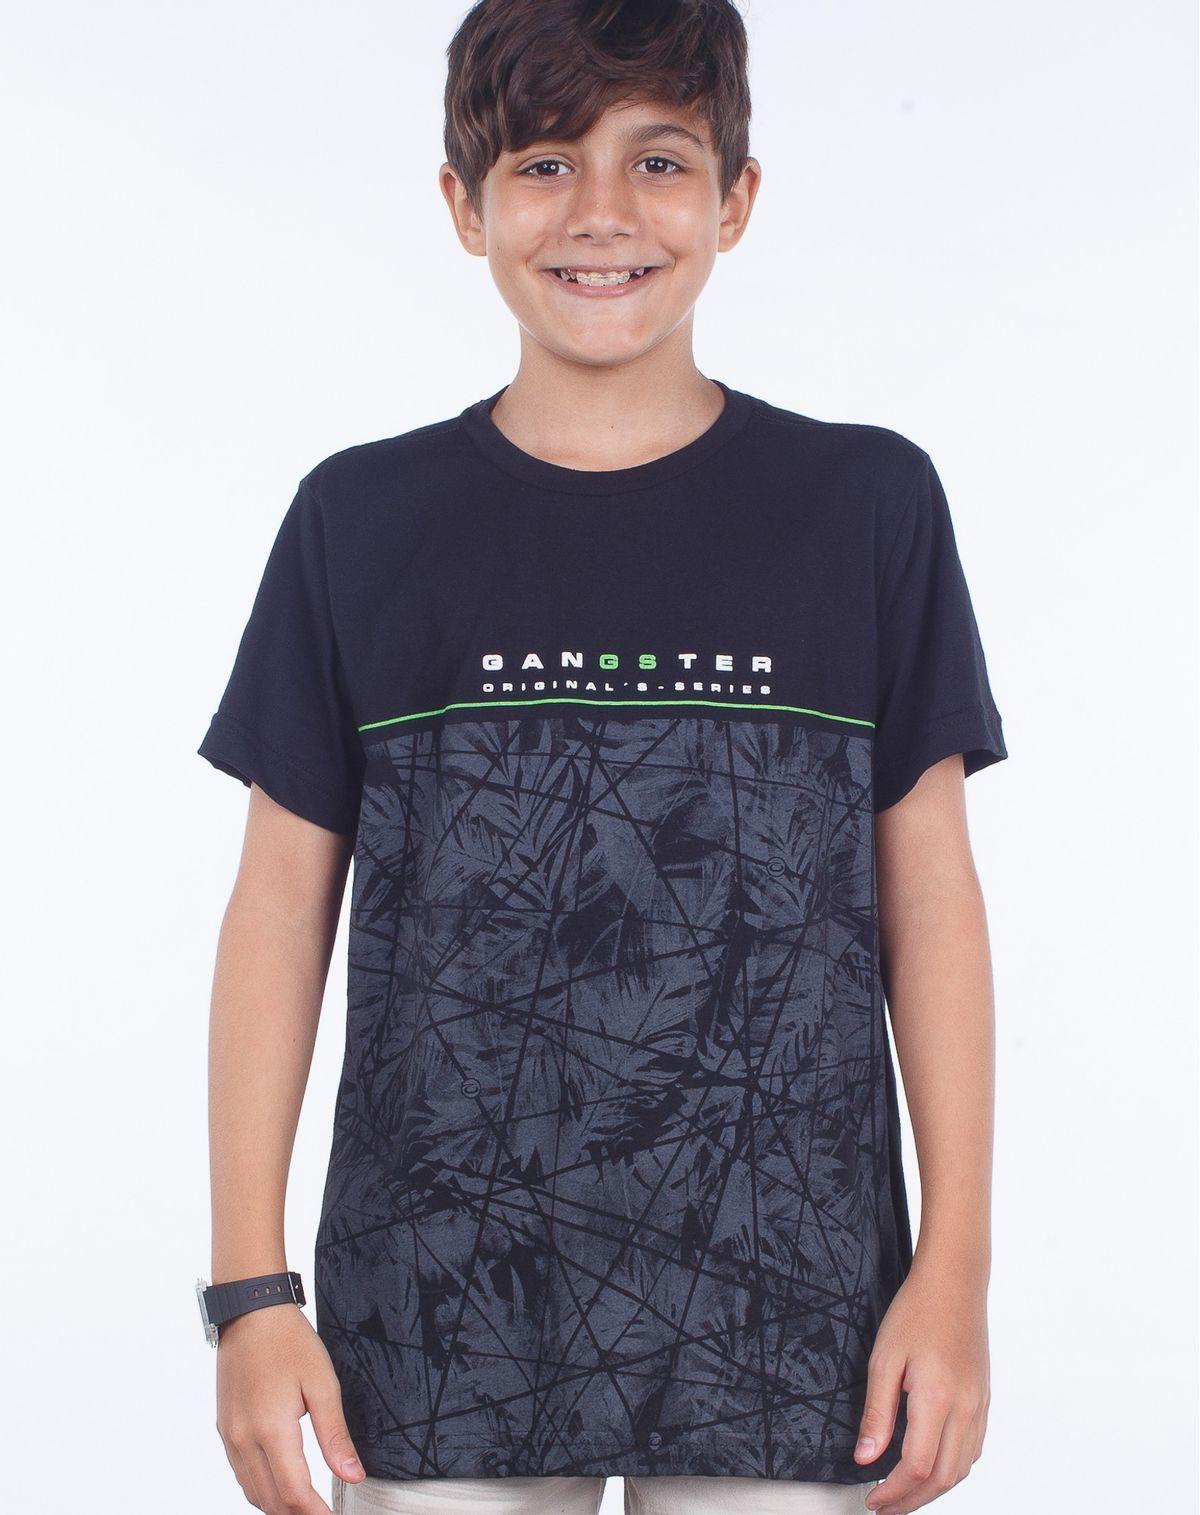 2050005775838-Camiseta-Juvenil-Estampa-Folhagem-PRETO-14-1